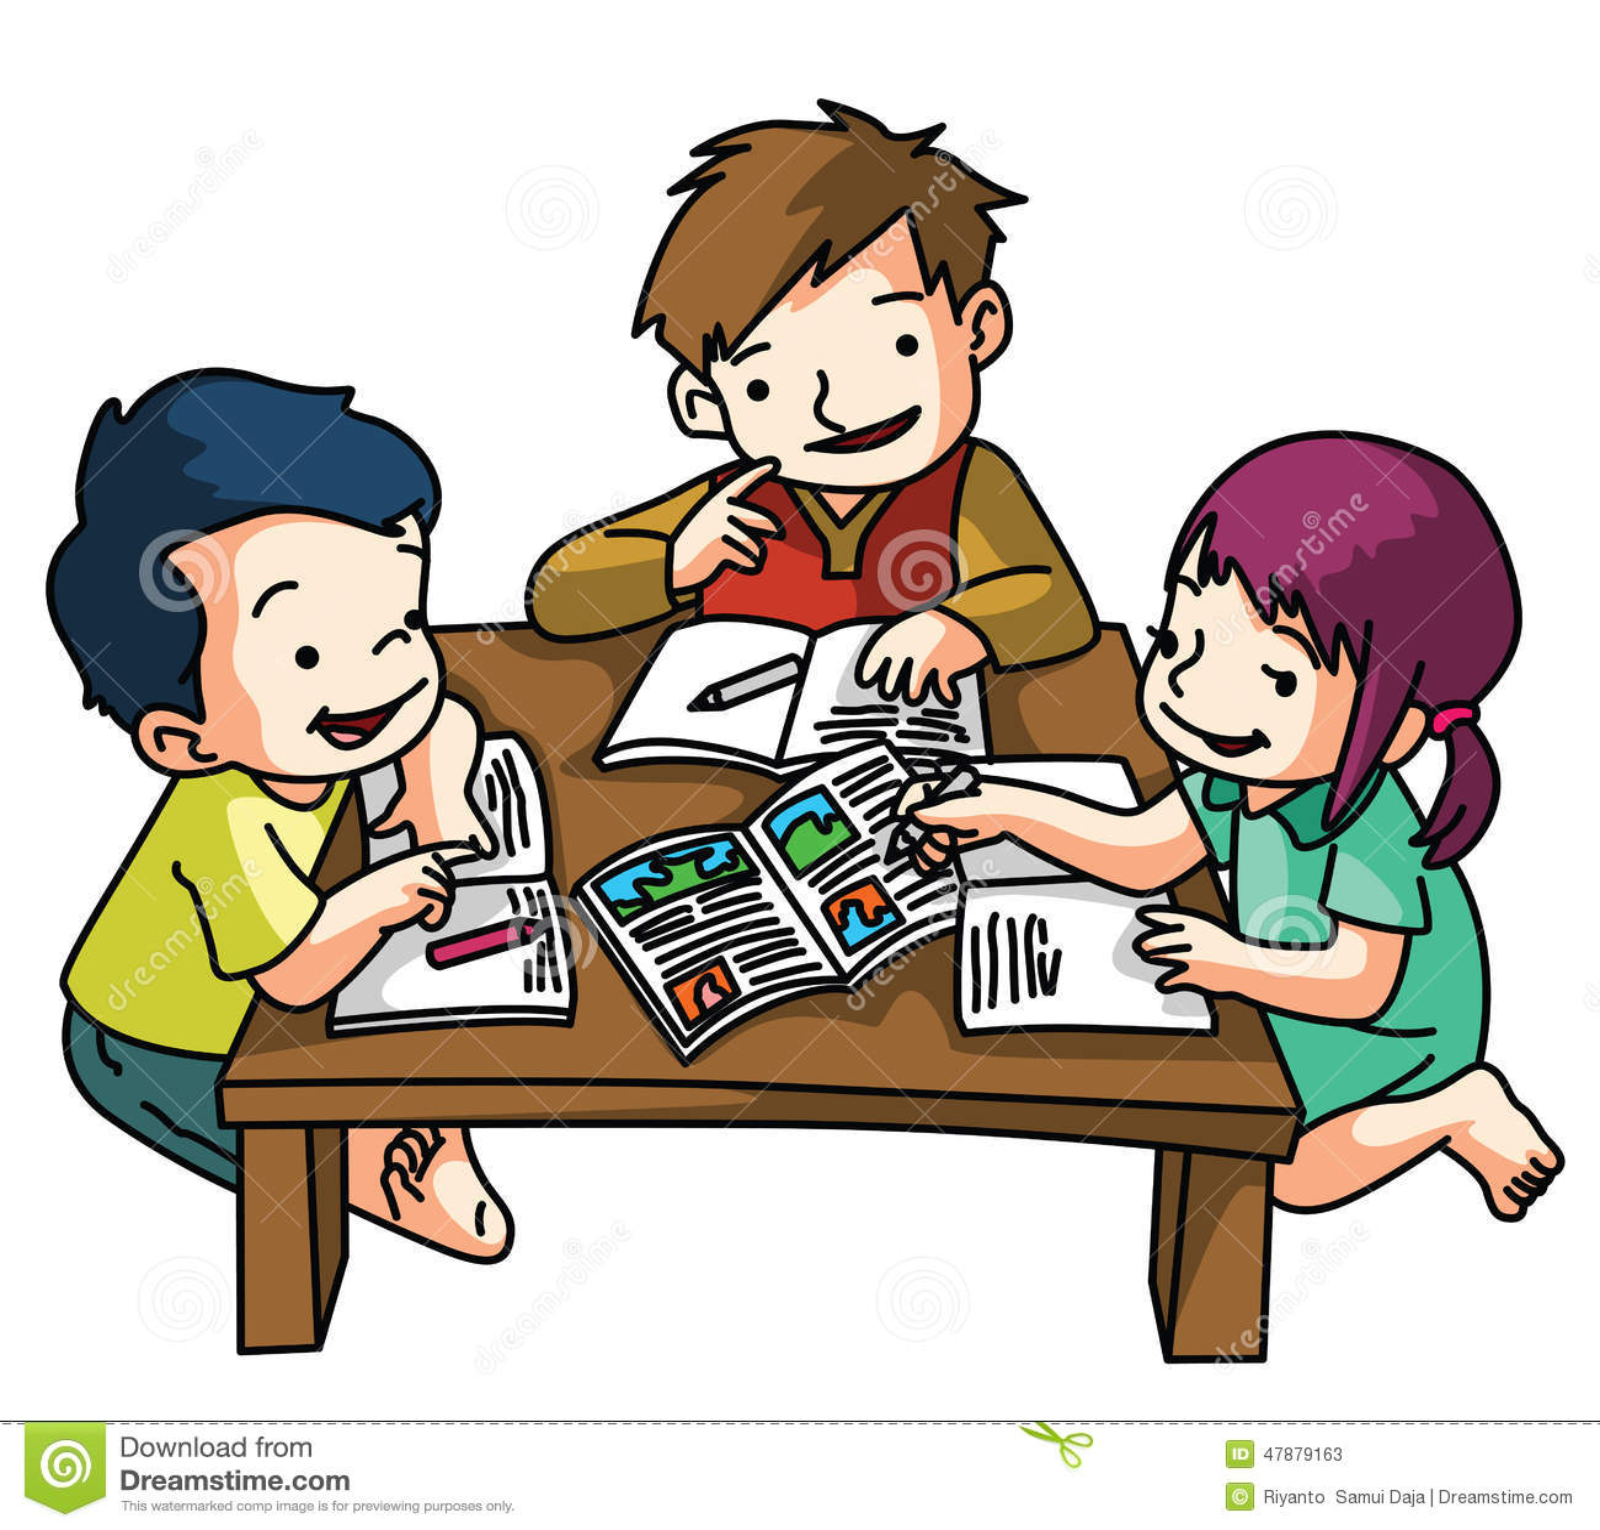 how to help kids study